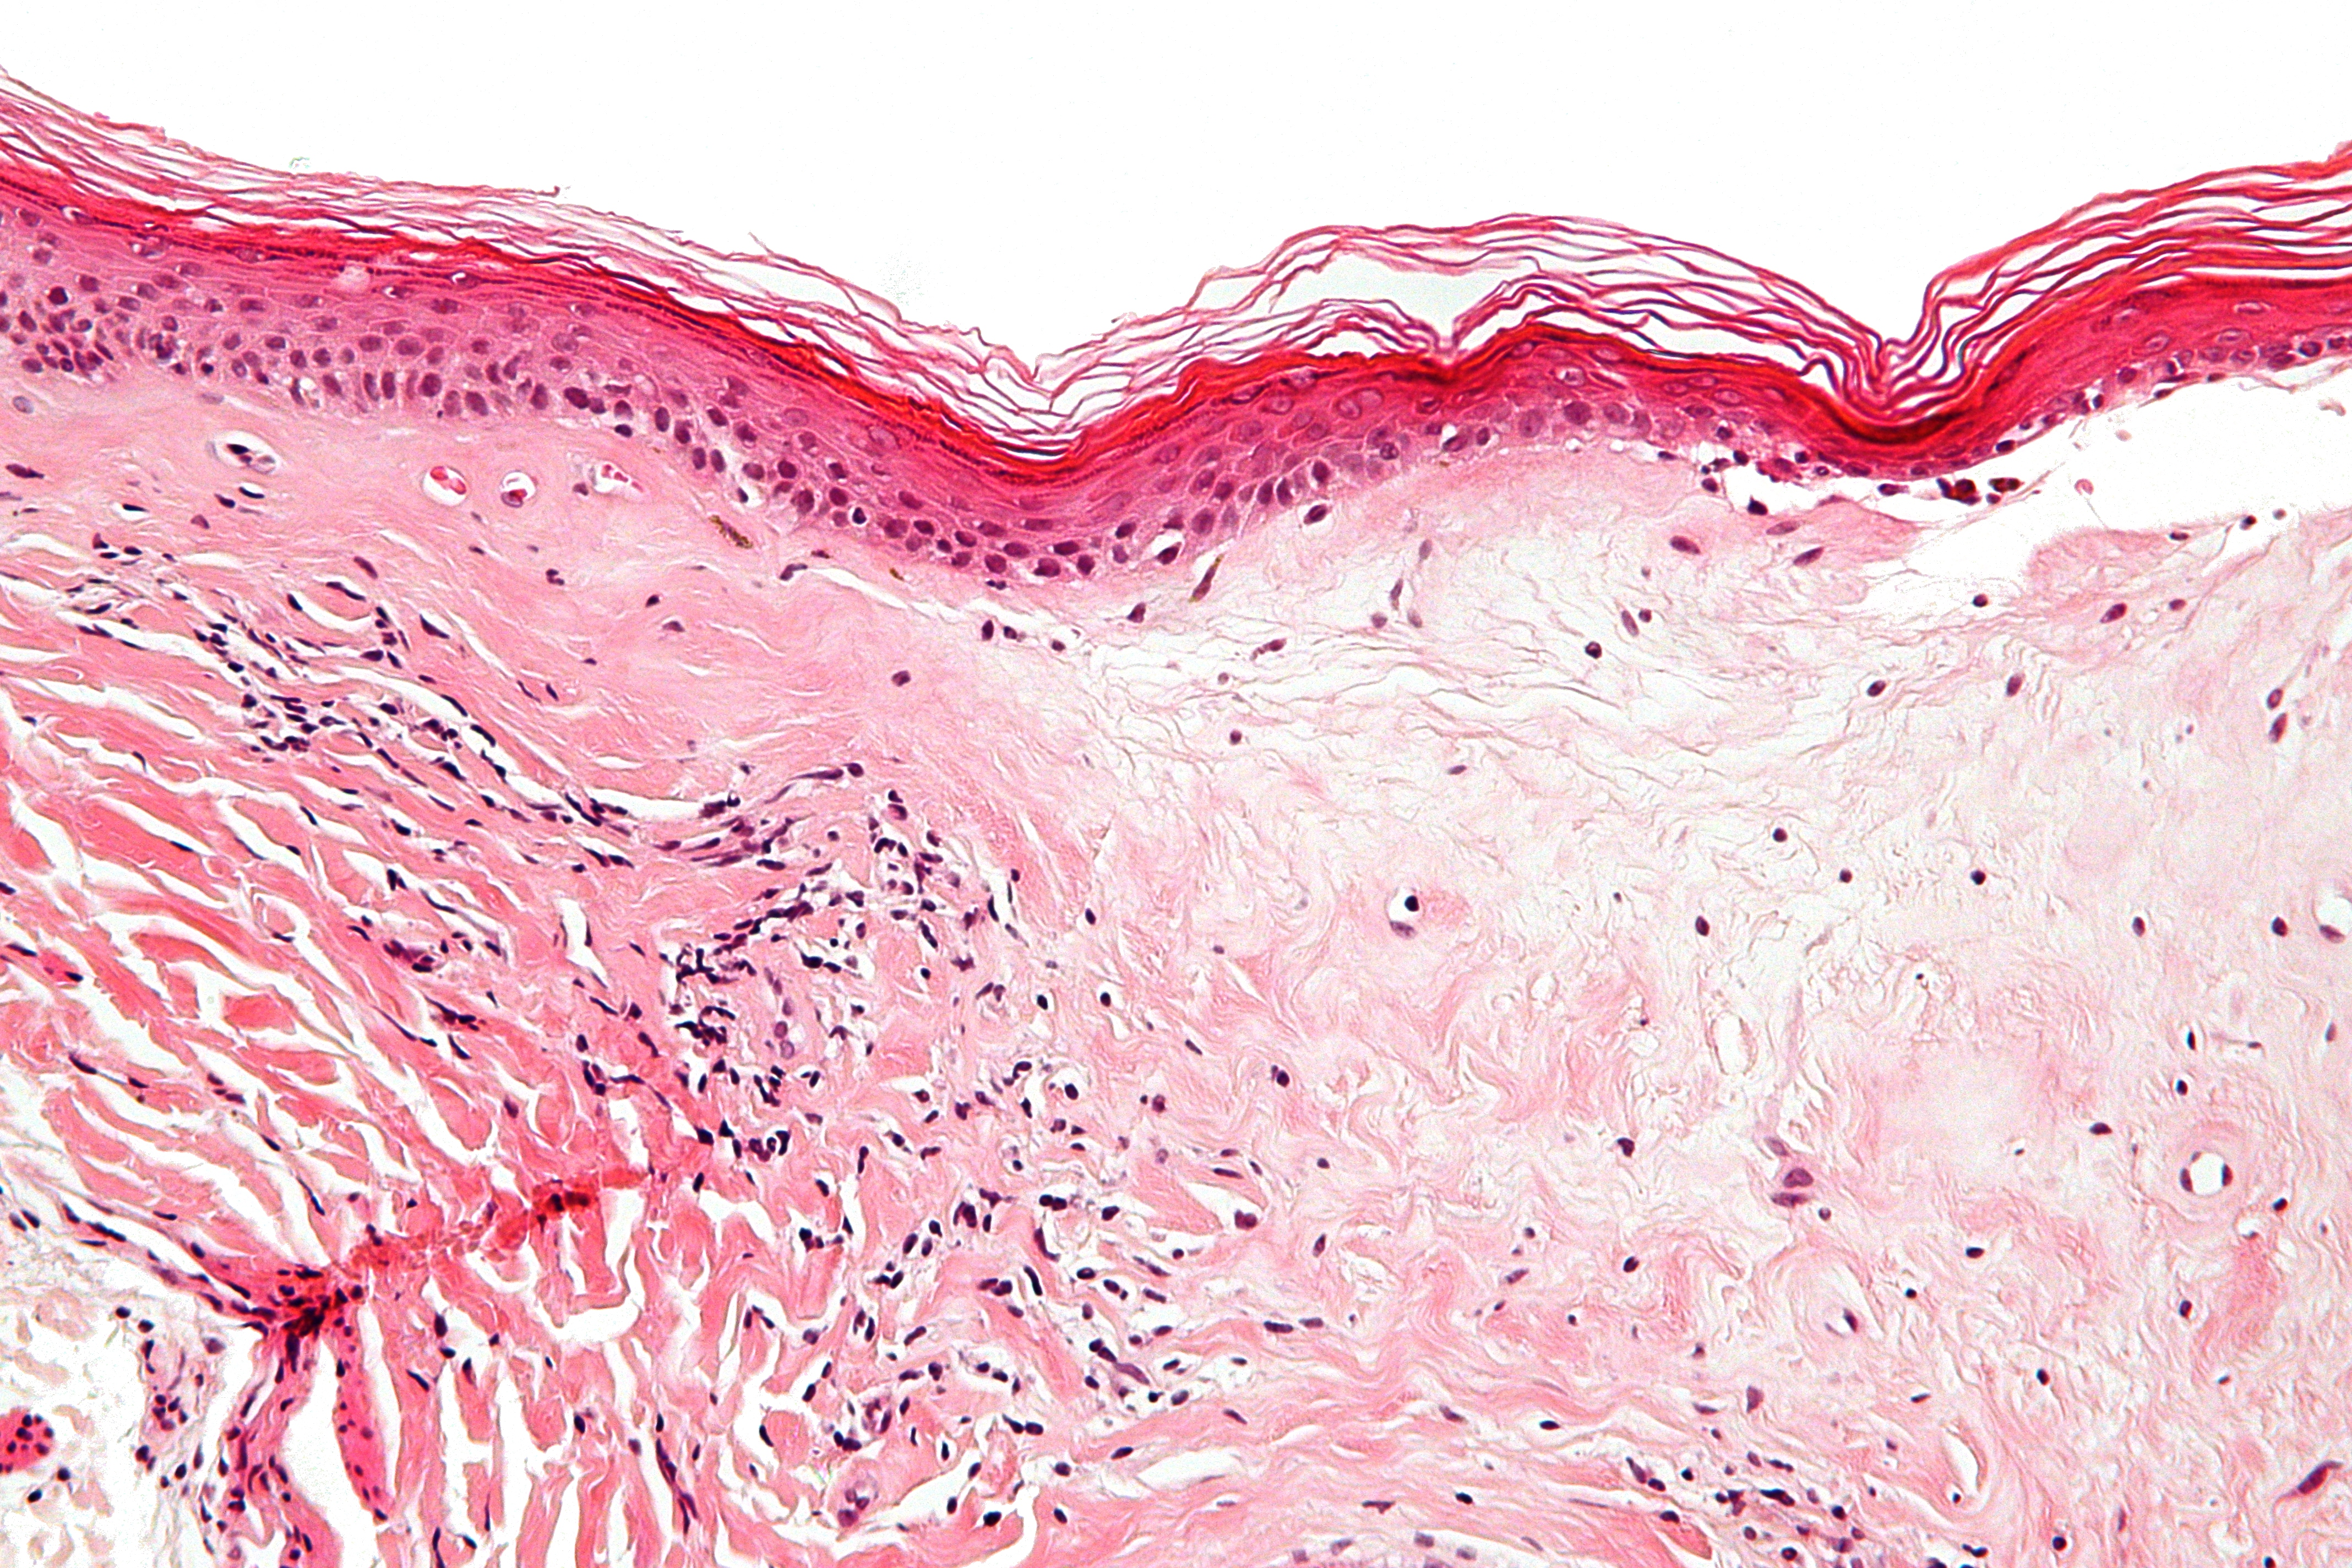 Hpv on the skin rash Hpv symptoms skin rash - csrb.ro